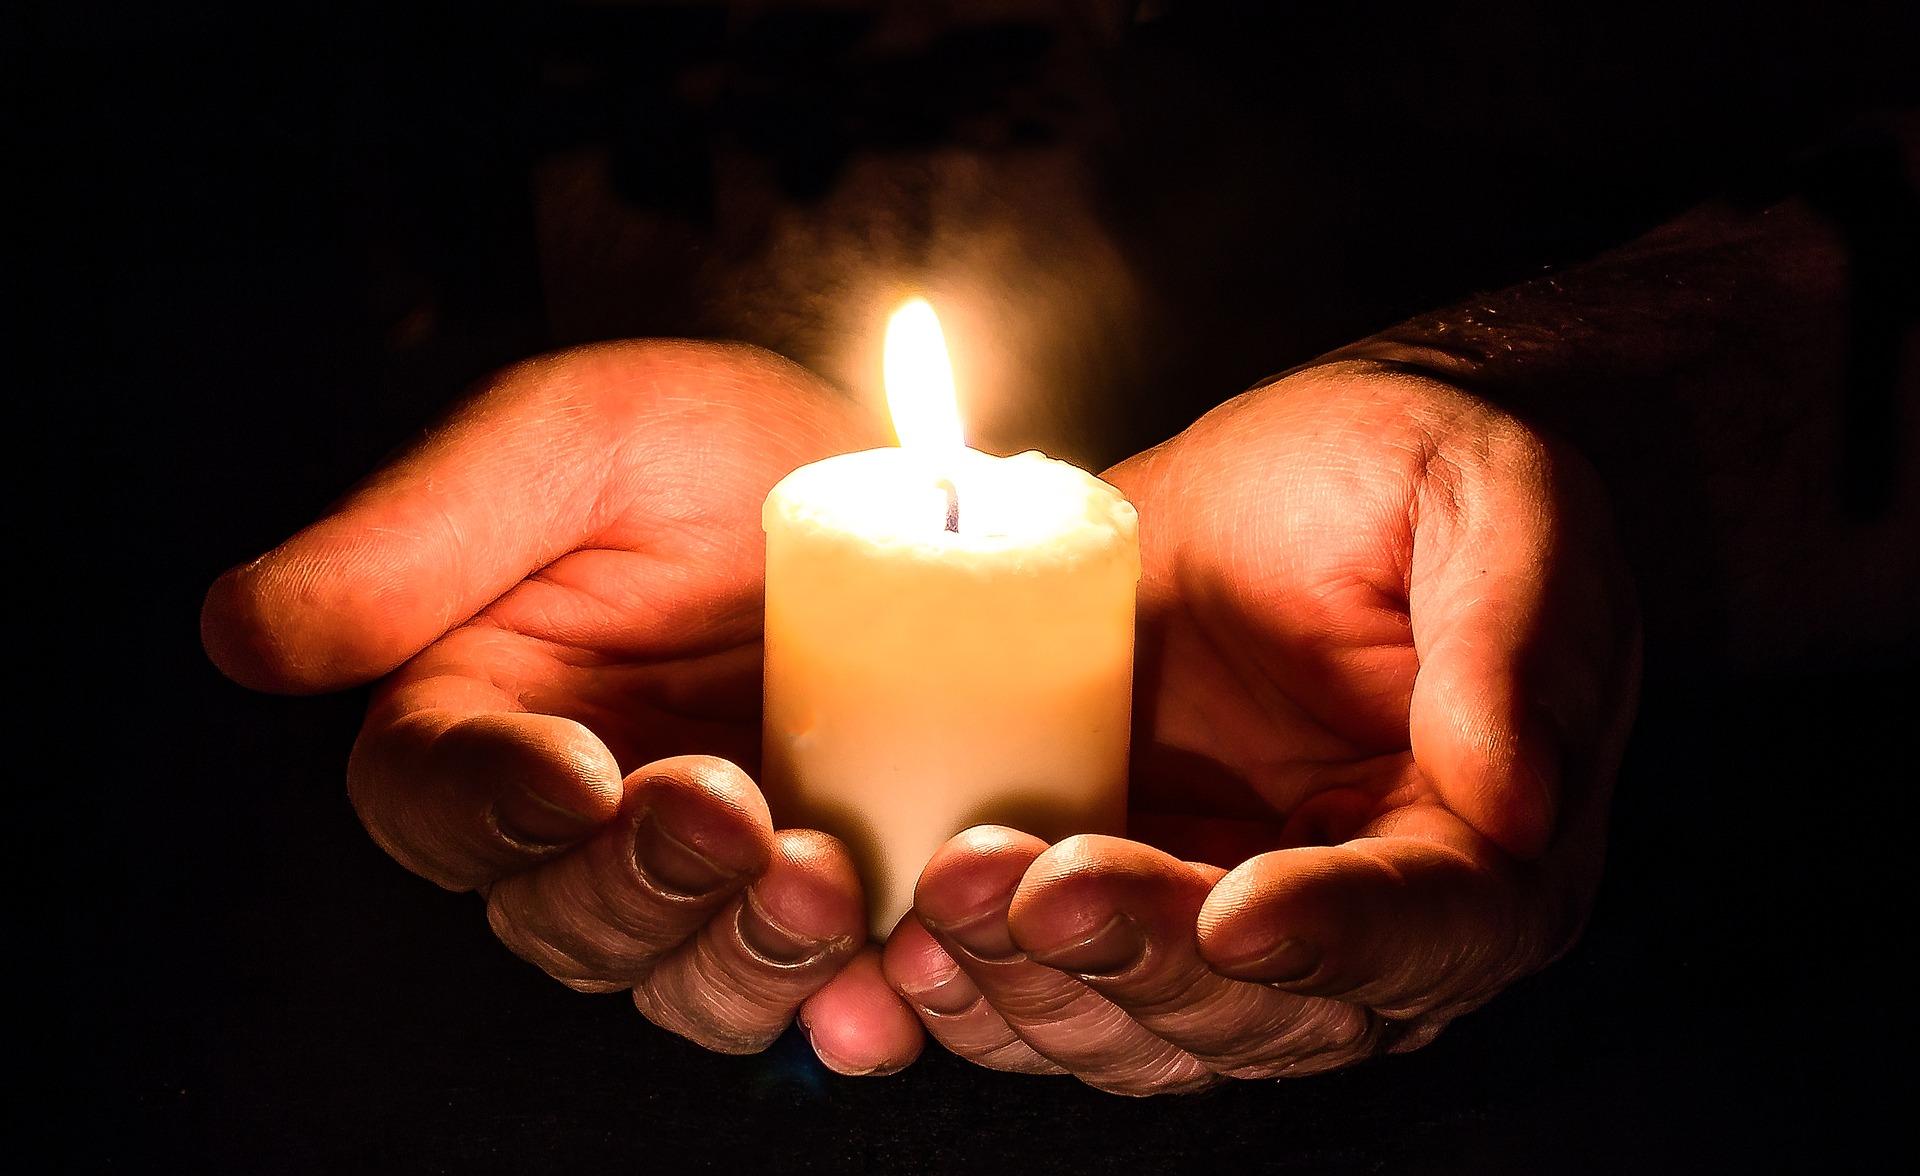 Prayer Request for Dakota Miller, Boy Who Accidentally Shot Himself